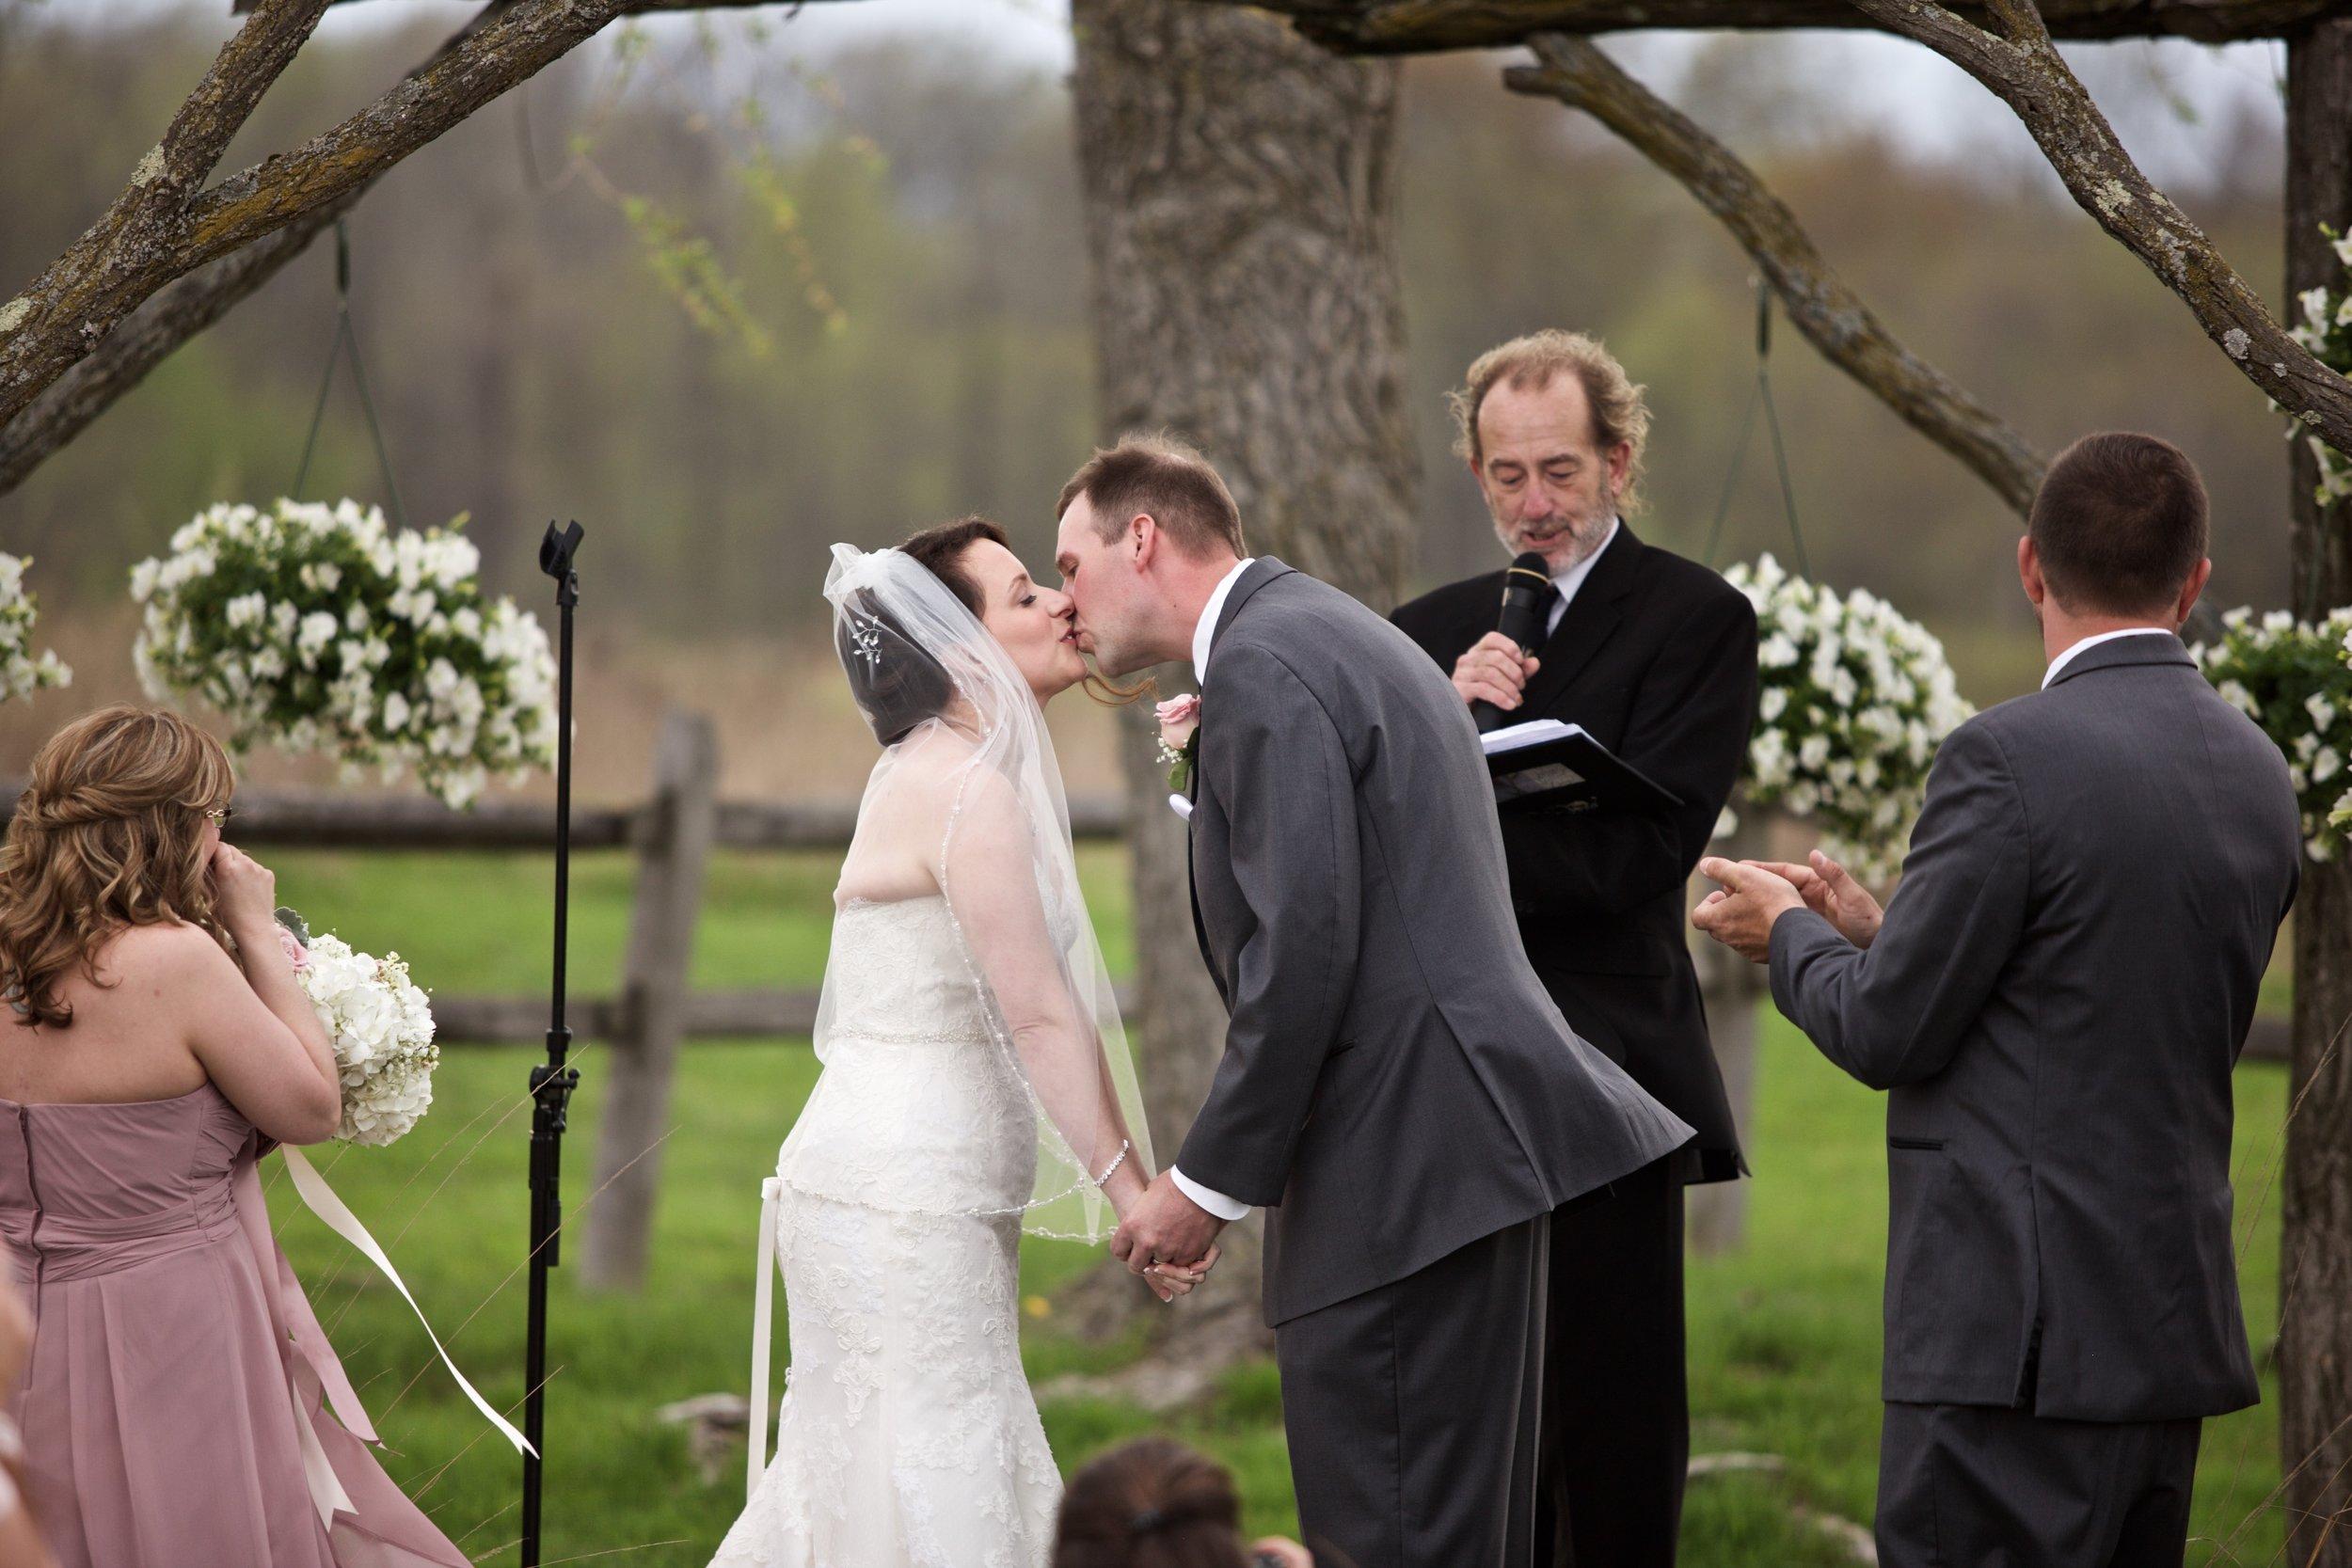 Lippincott manor wedding, wallkill ny wedding, photography, photos f.jpg